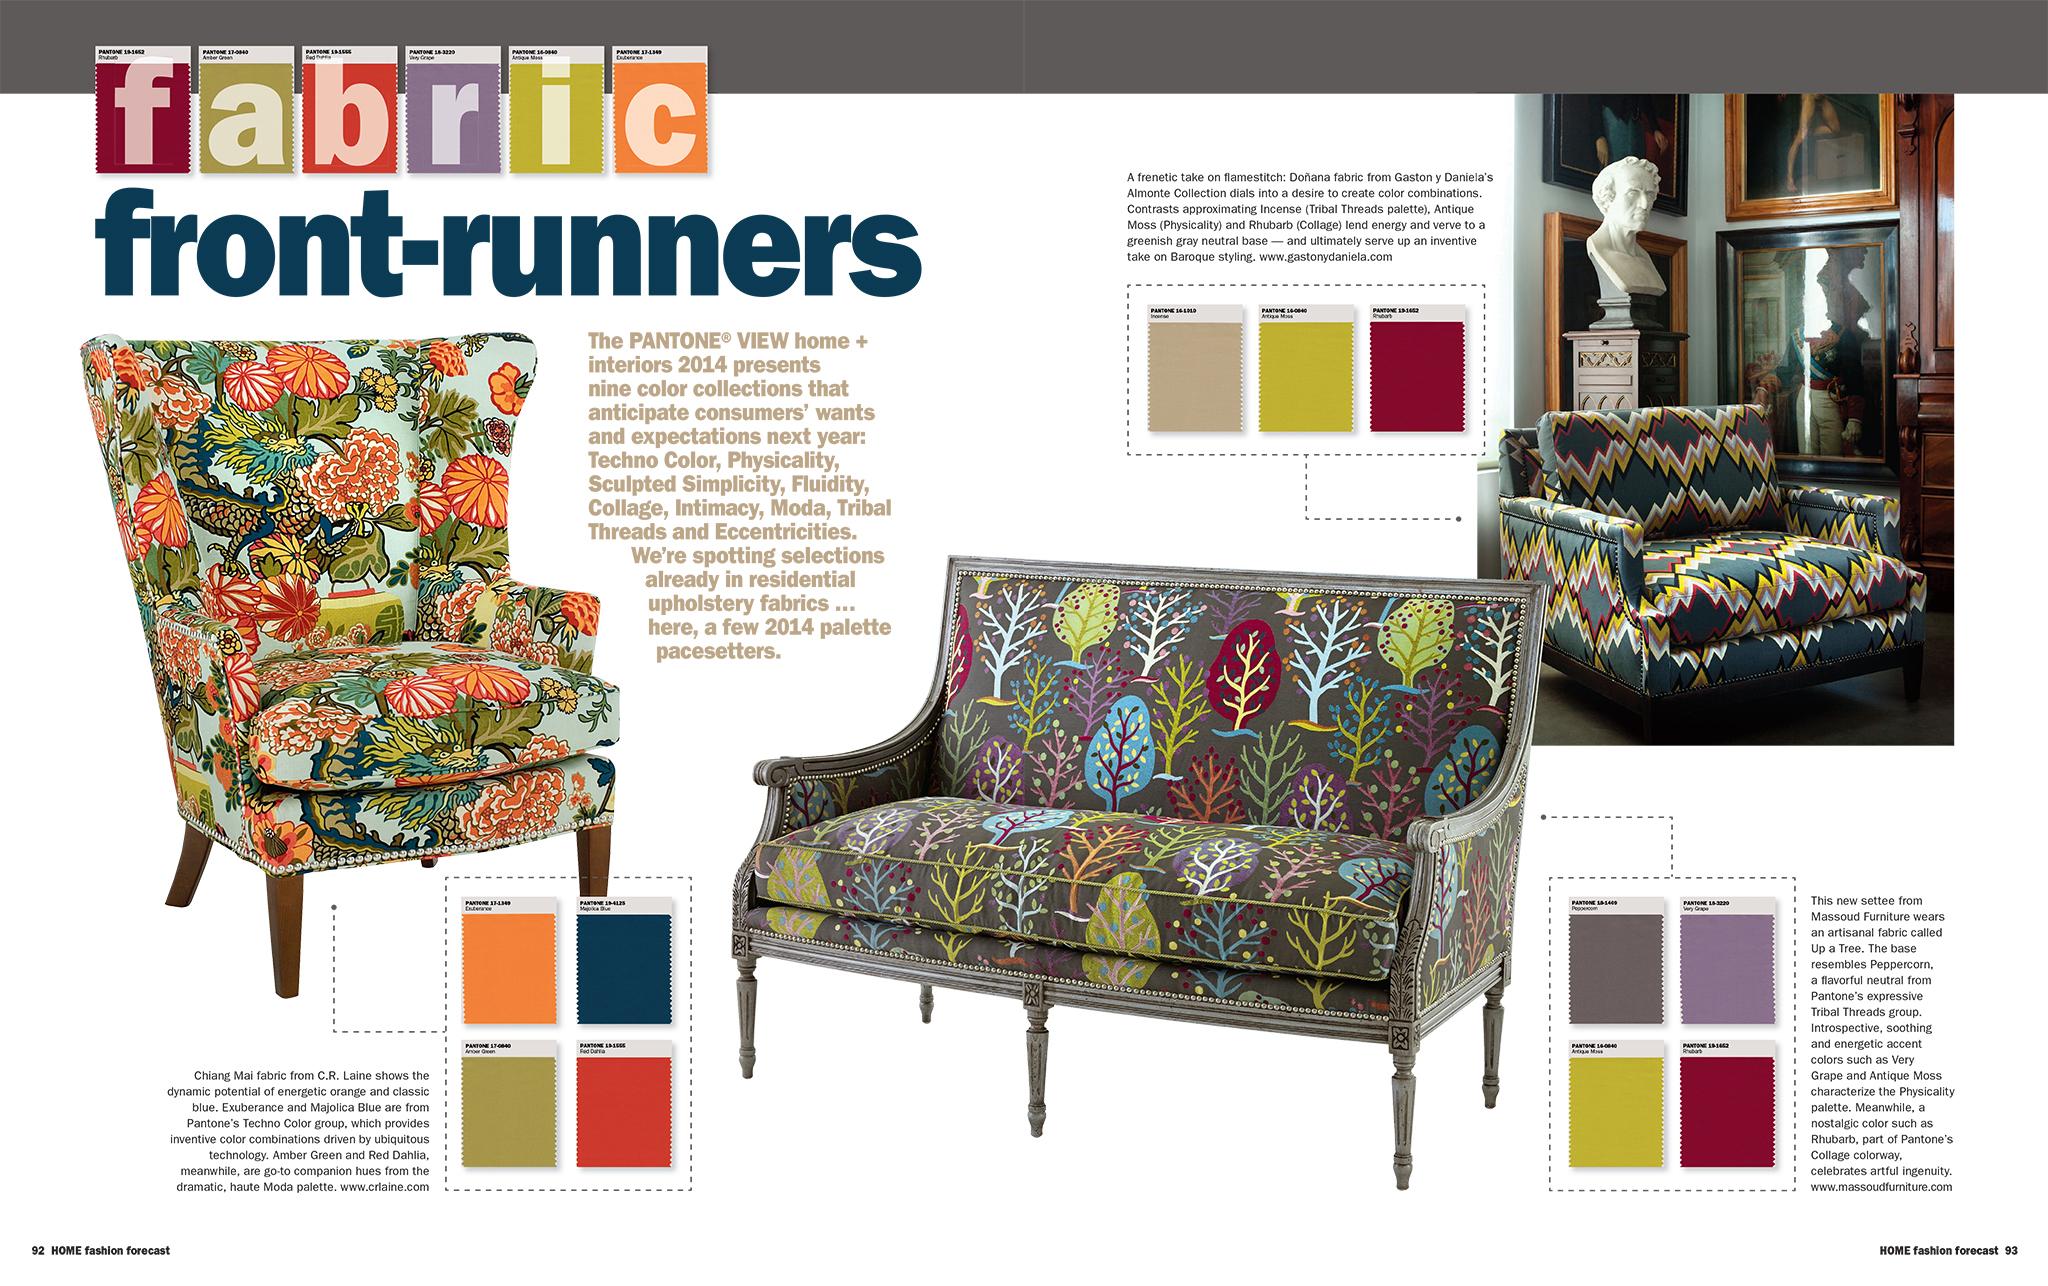 Home fashion forecast massoud furniture for Home fashion